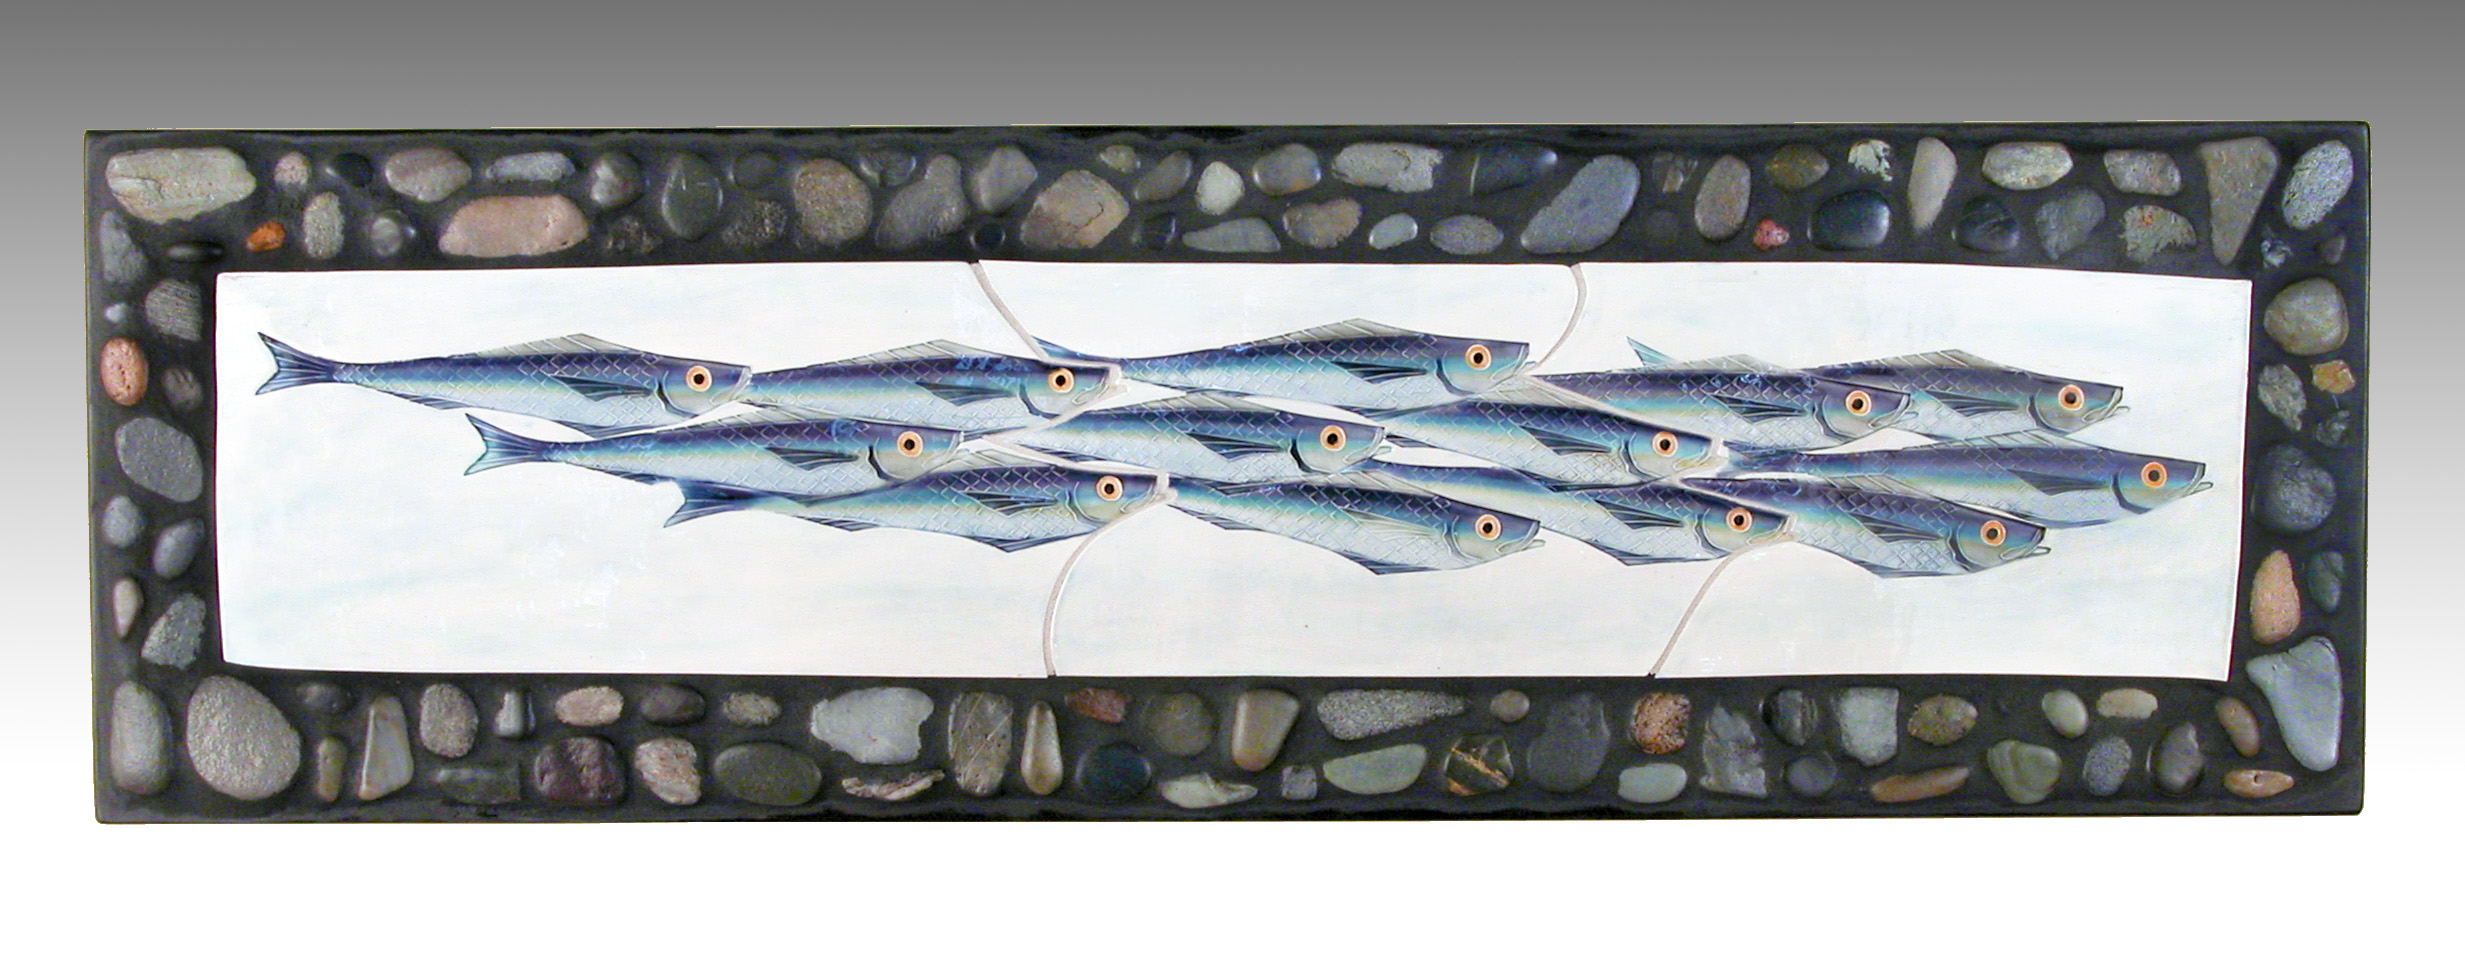 Fish School Plaque